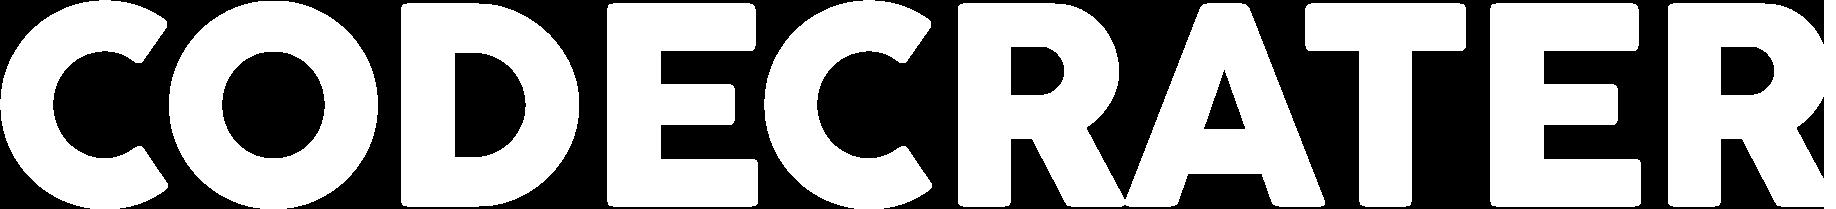 CodeCrater